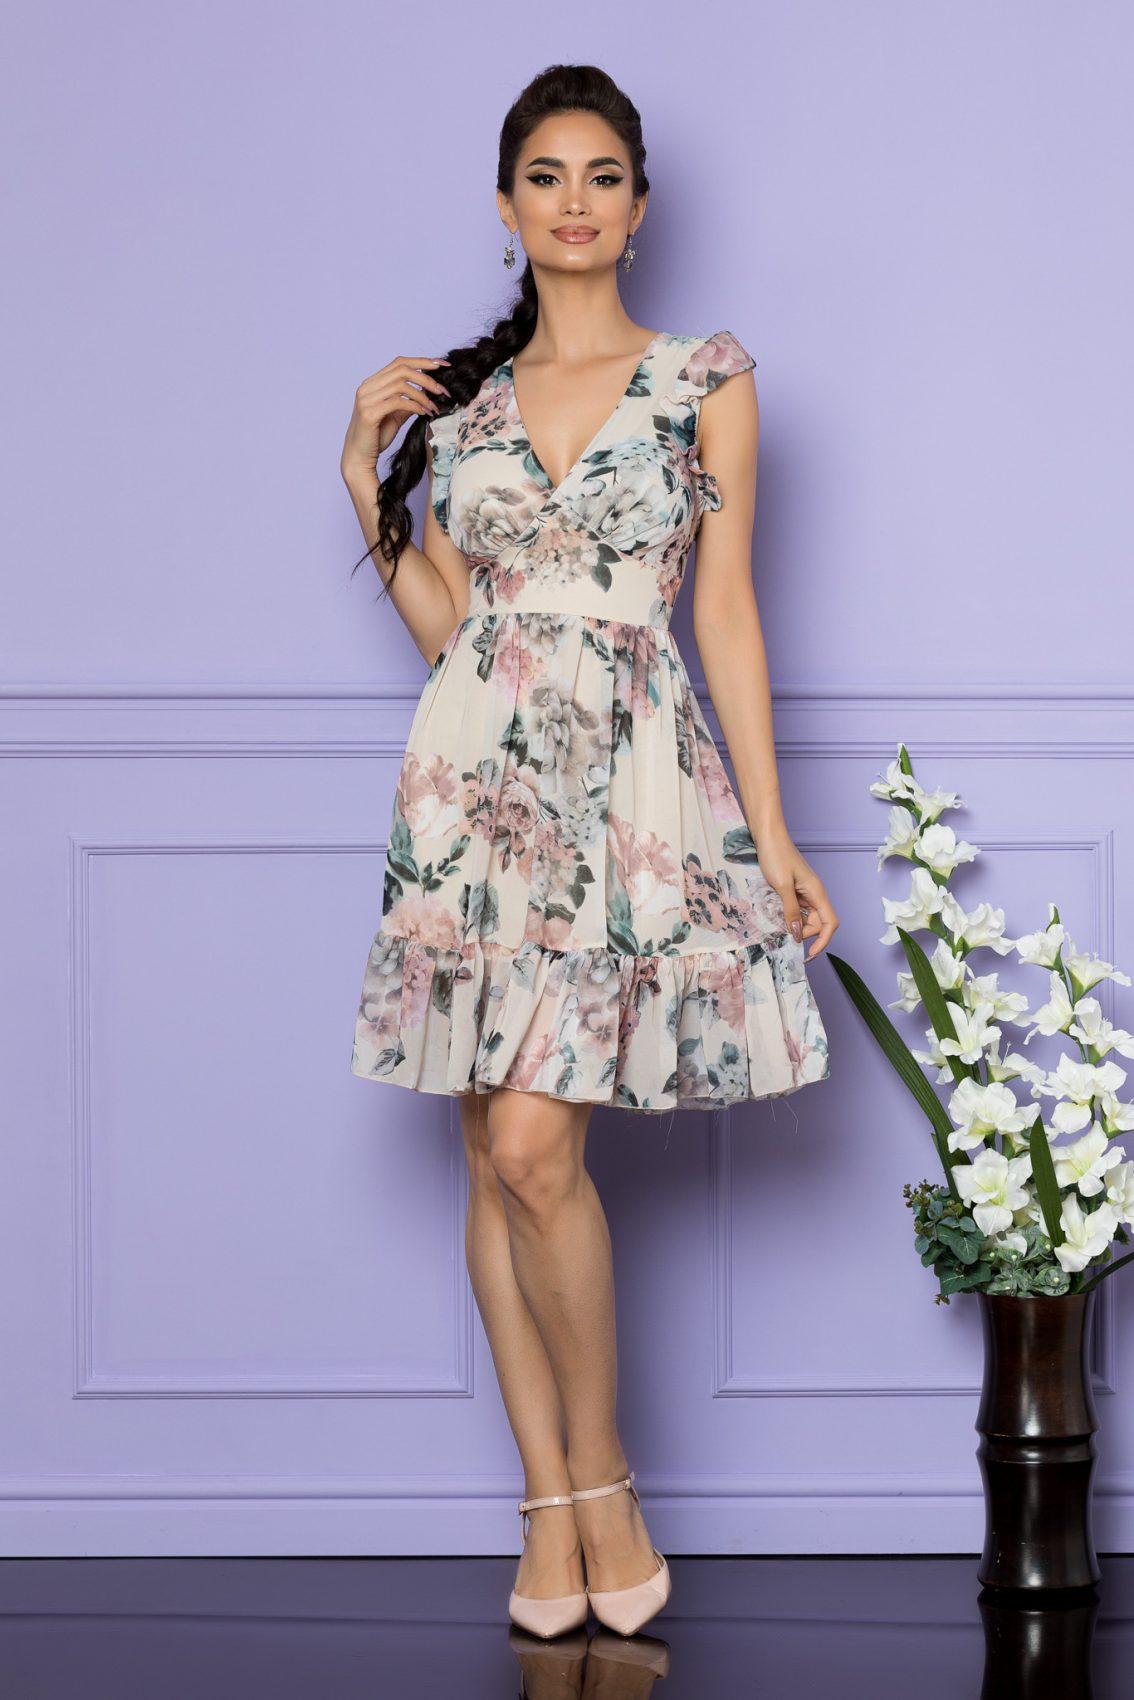 Nude Αμάνικο Φόρεμα Με Βολάν Elody A759 1